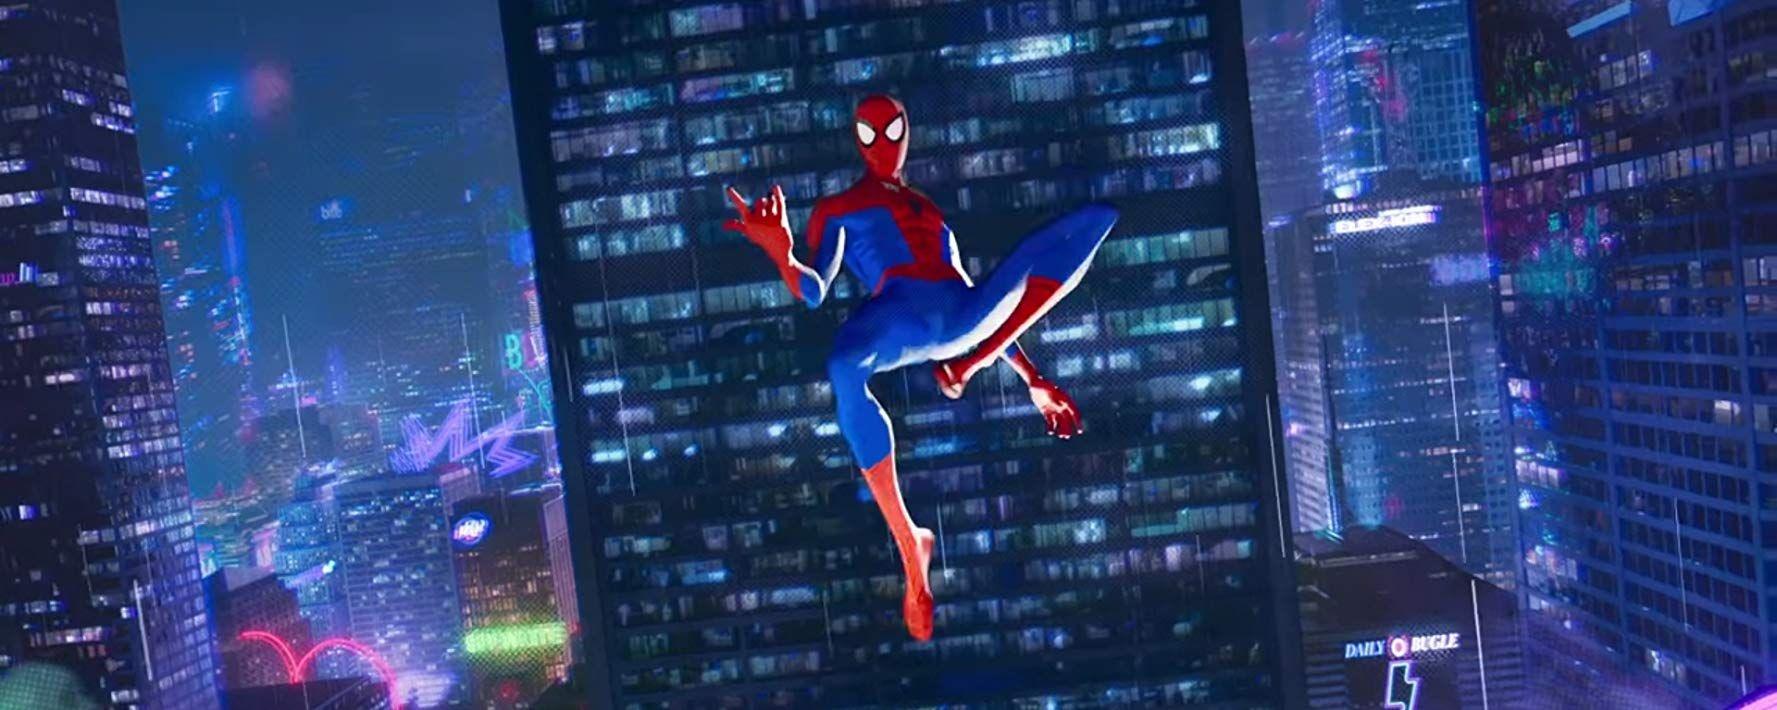 Jake Johnson In Spider Man Into The Spider Verse 2018 Spider Verse Spiderman Art Spiderman